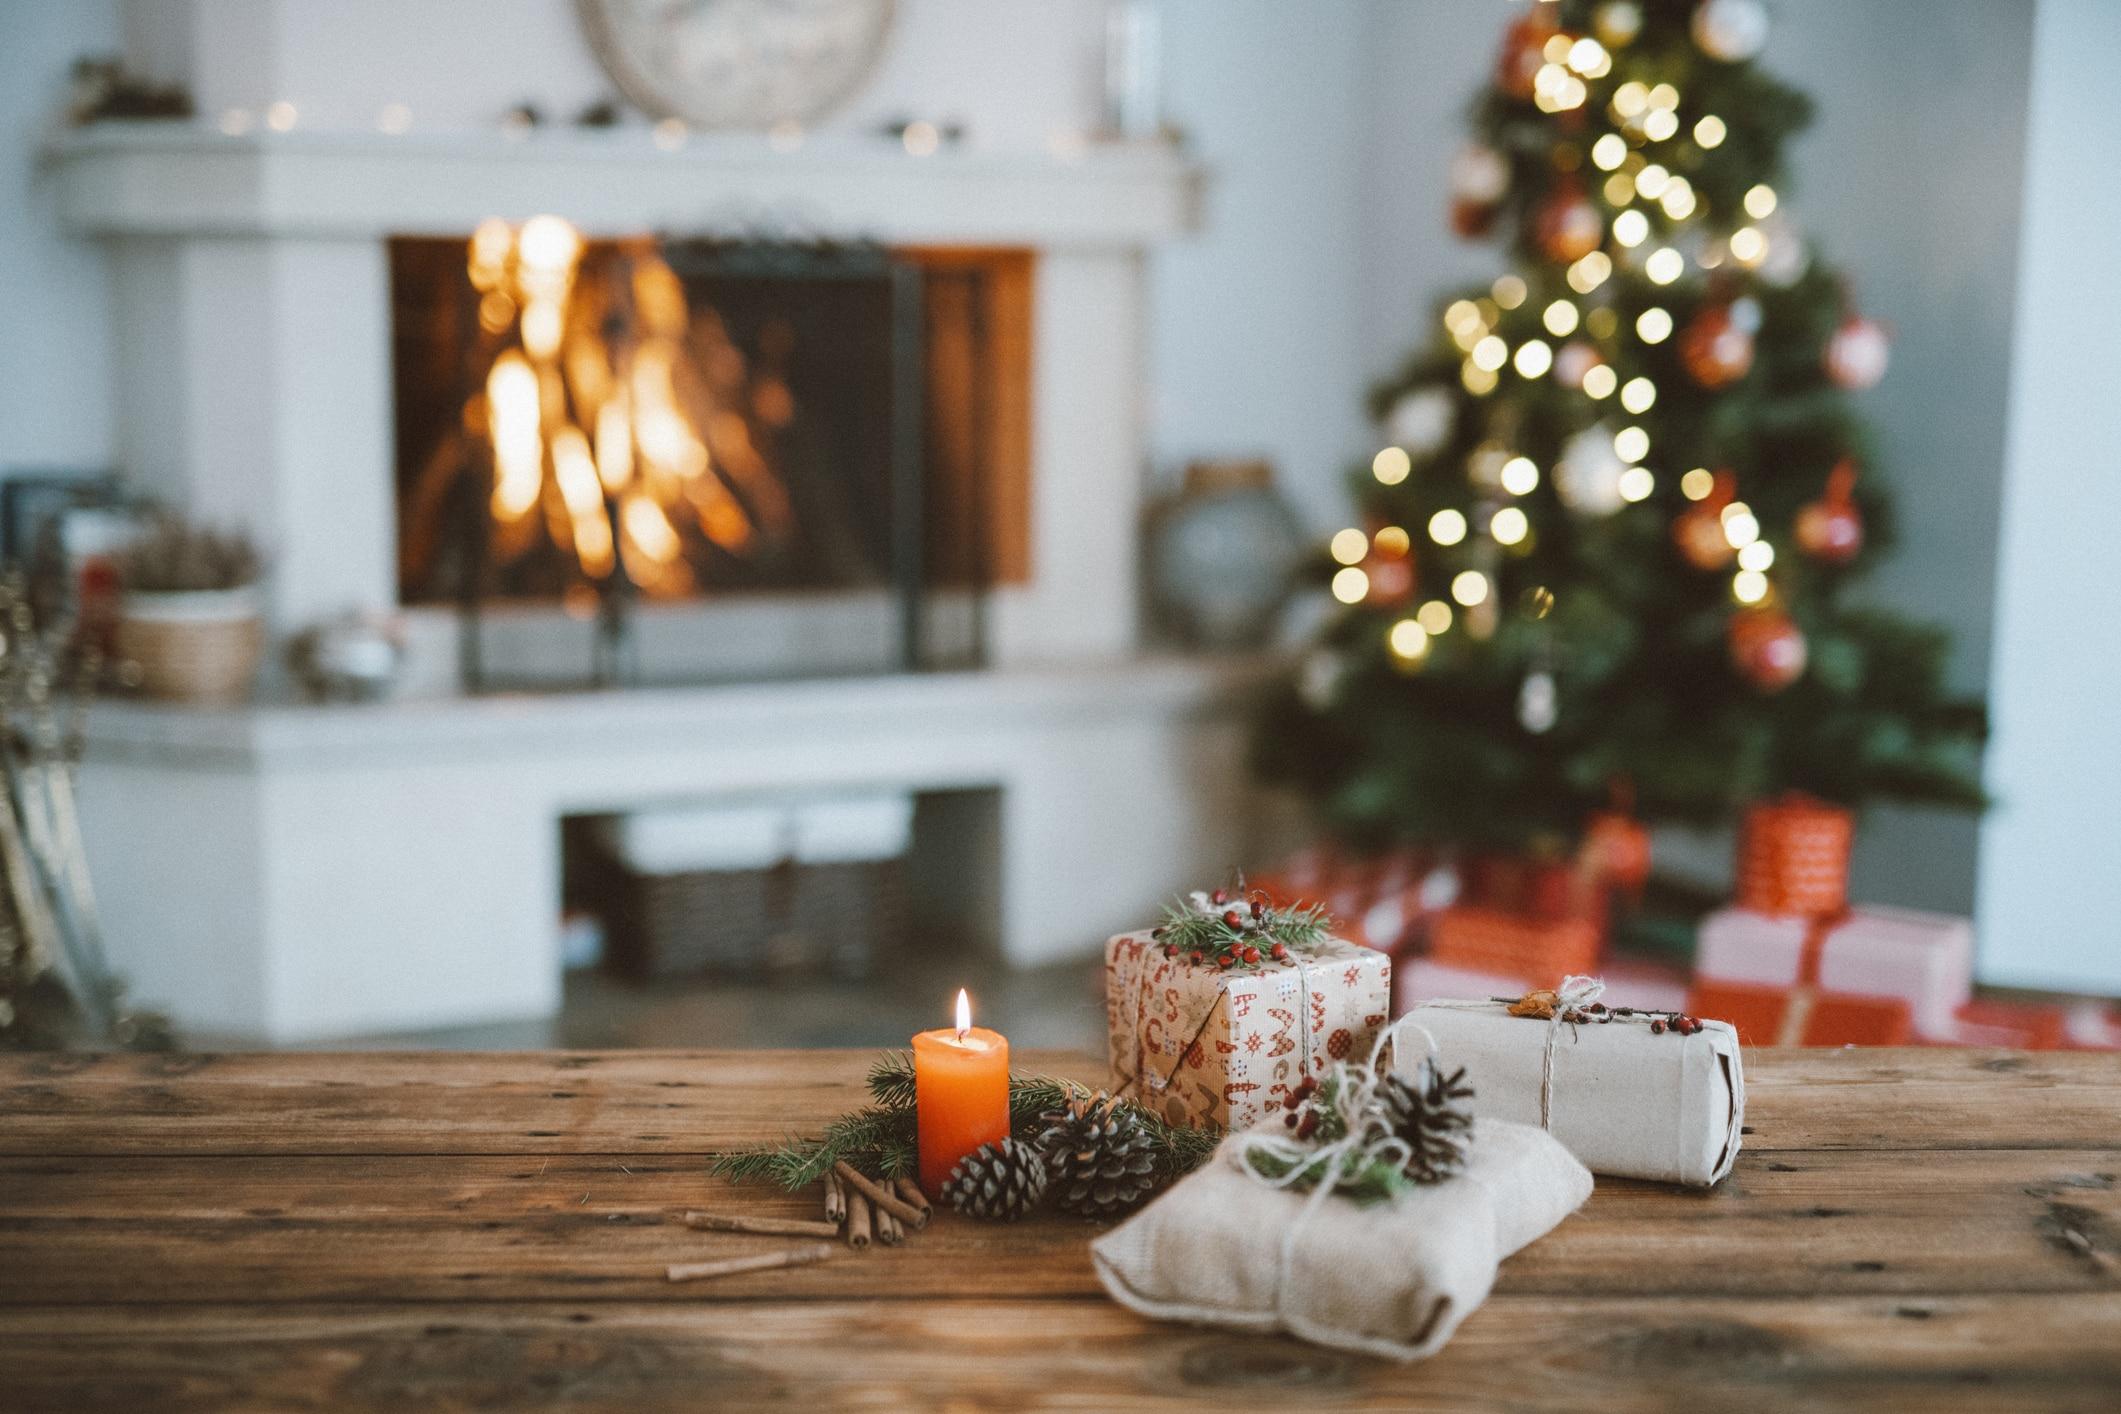 editors' picks for christmas and winter